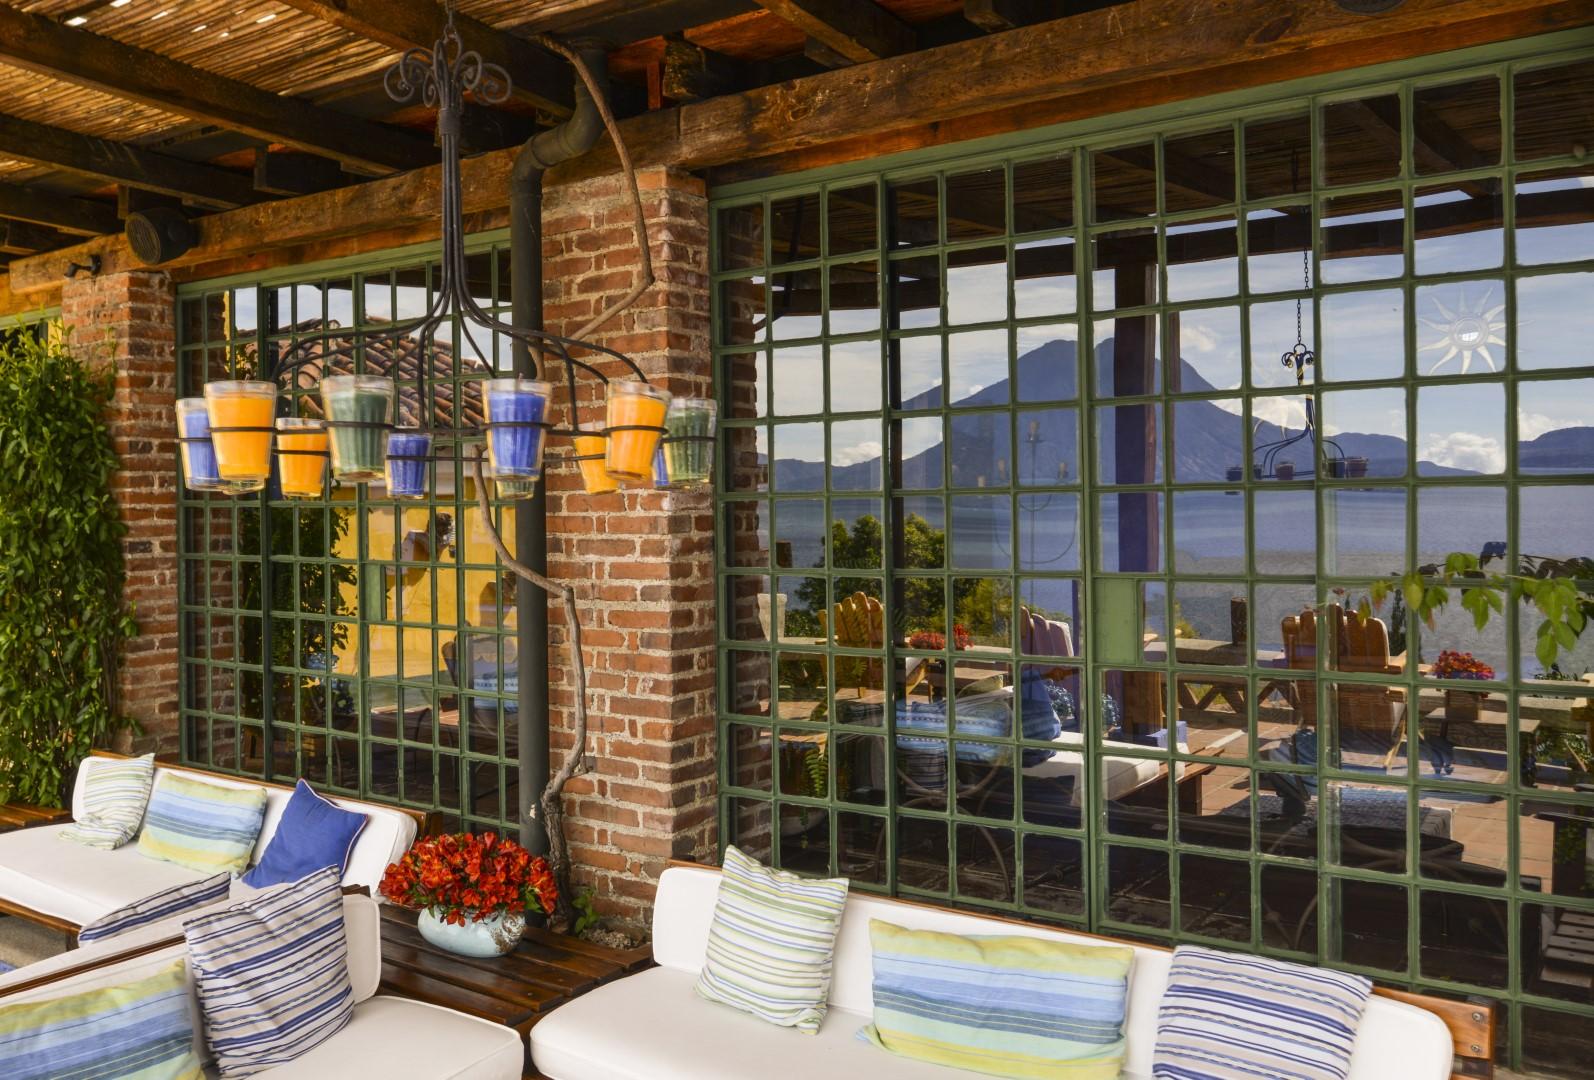 Reflection in window at Casa Palopo in Lake Atitlan